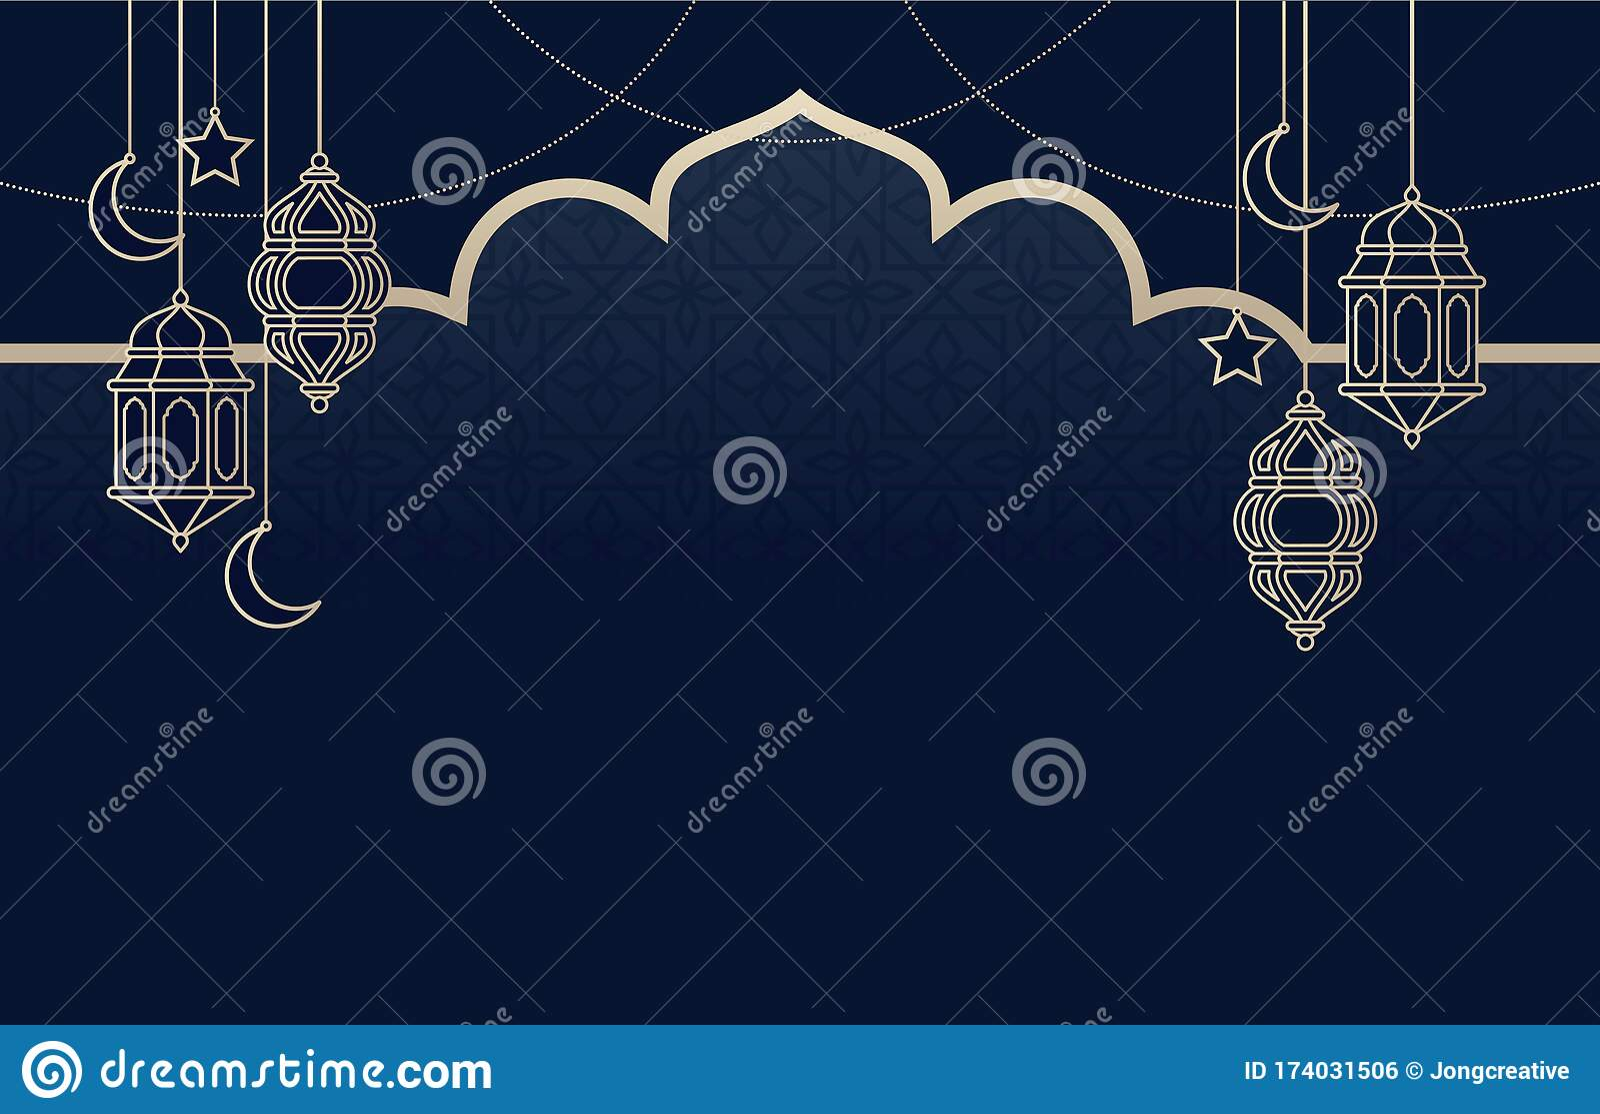 Islamic Arabic Lantern For Ramadan Kareem Eid Mubarak Background Stock Vector Illustration Of Glowing Frame 174031506